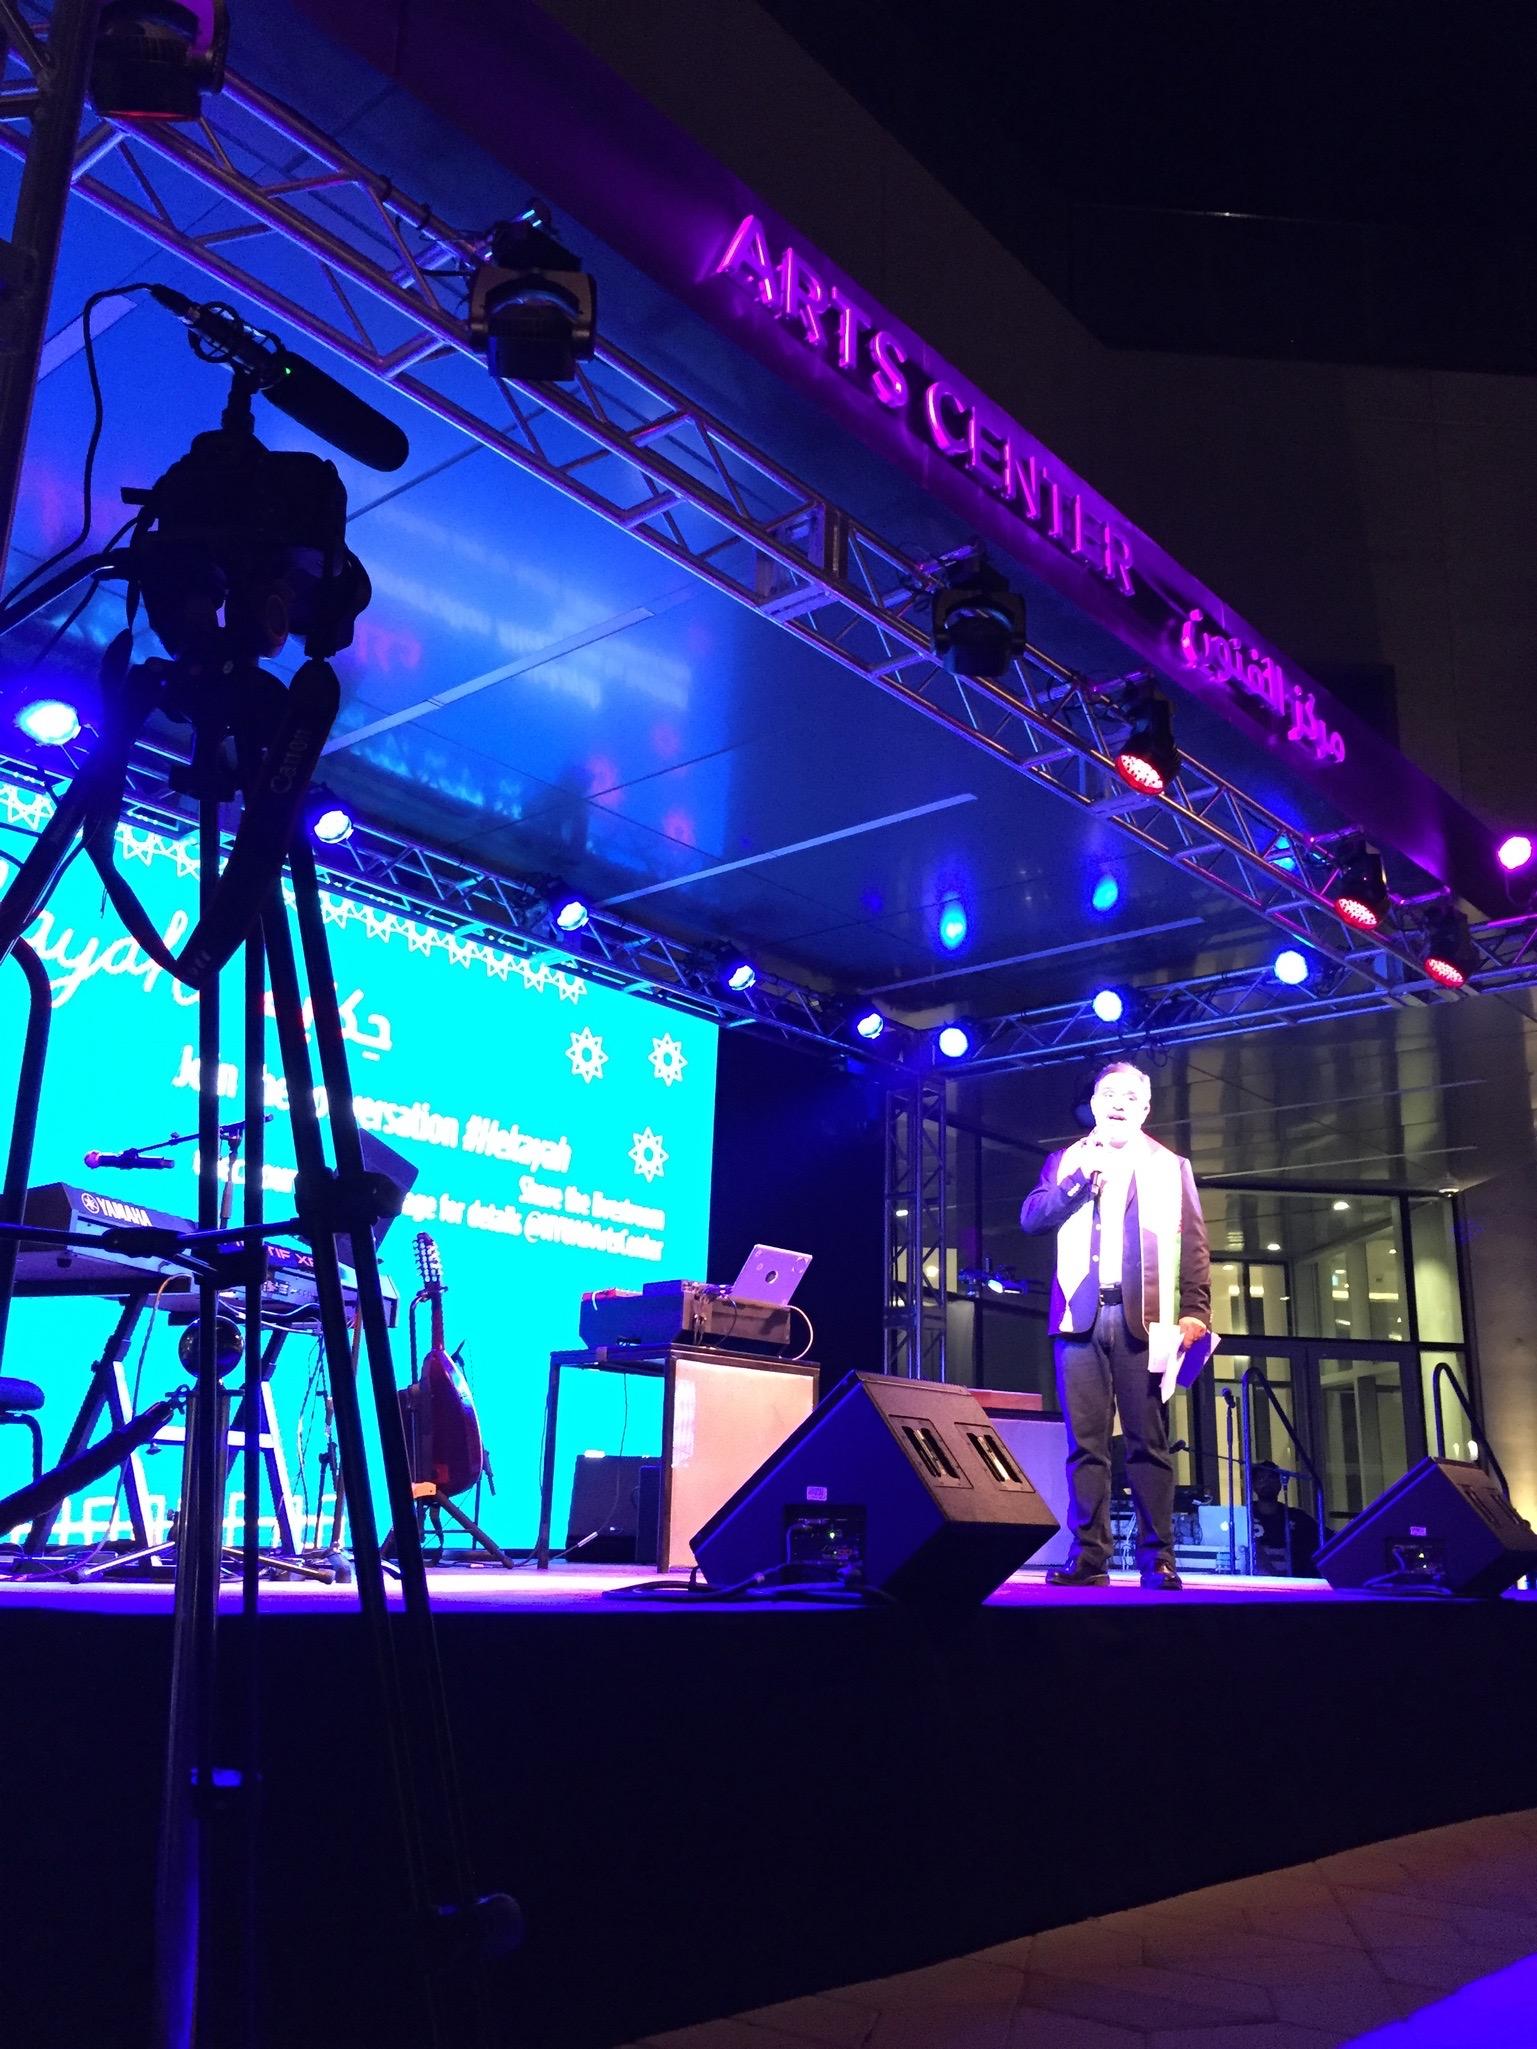 Hekayah event host